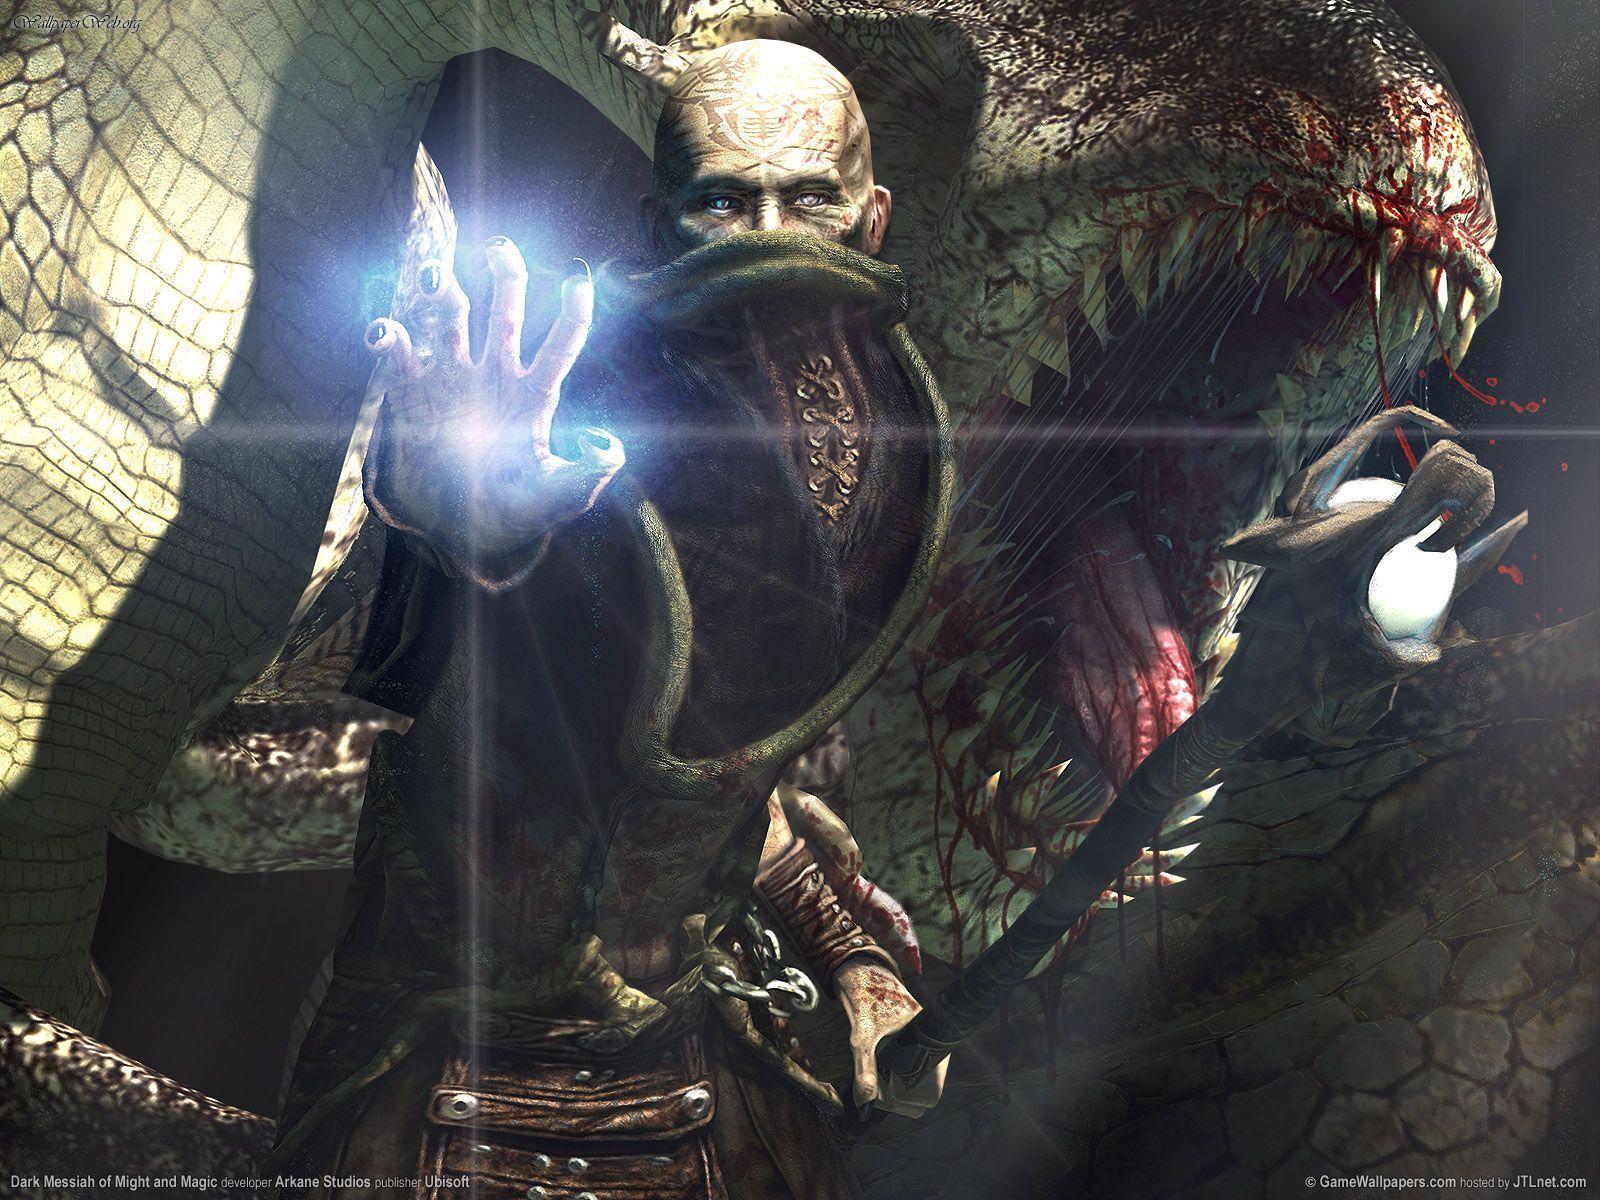 Wallpaper dark messiah of might and magic 02 1600